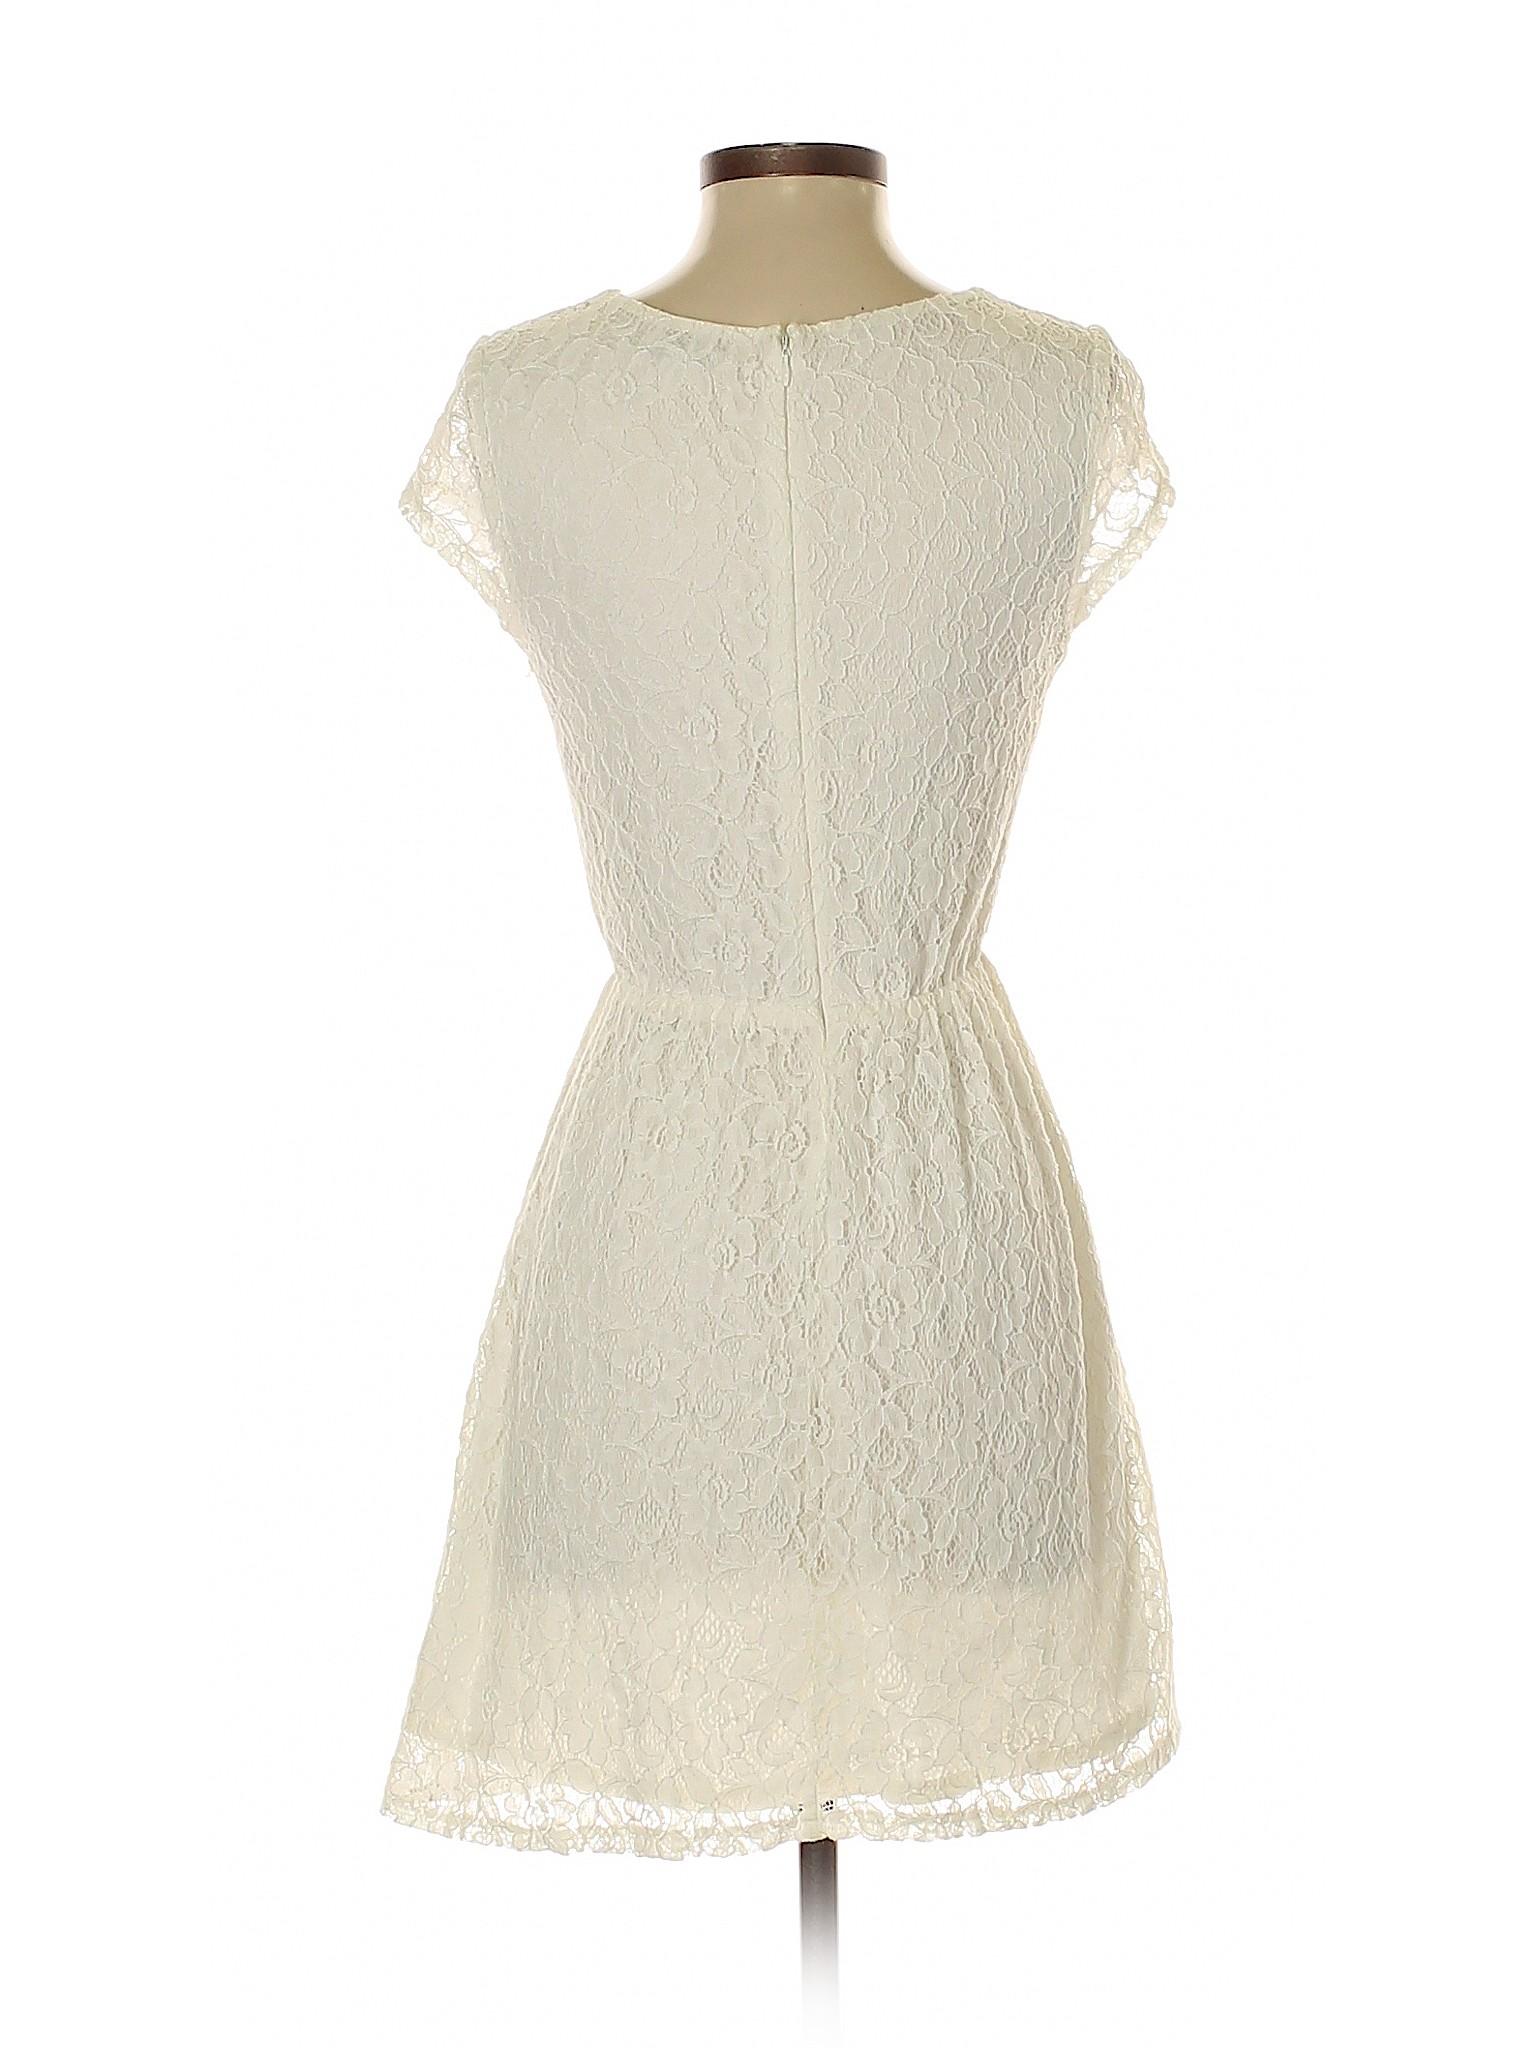 Gap Casual Dress winter Outlet Boutique Htqw5U4Cx